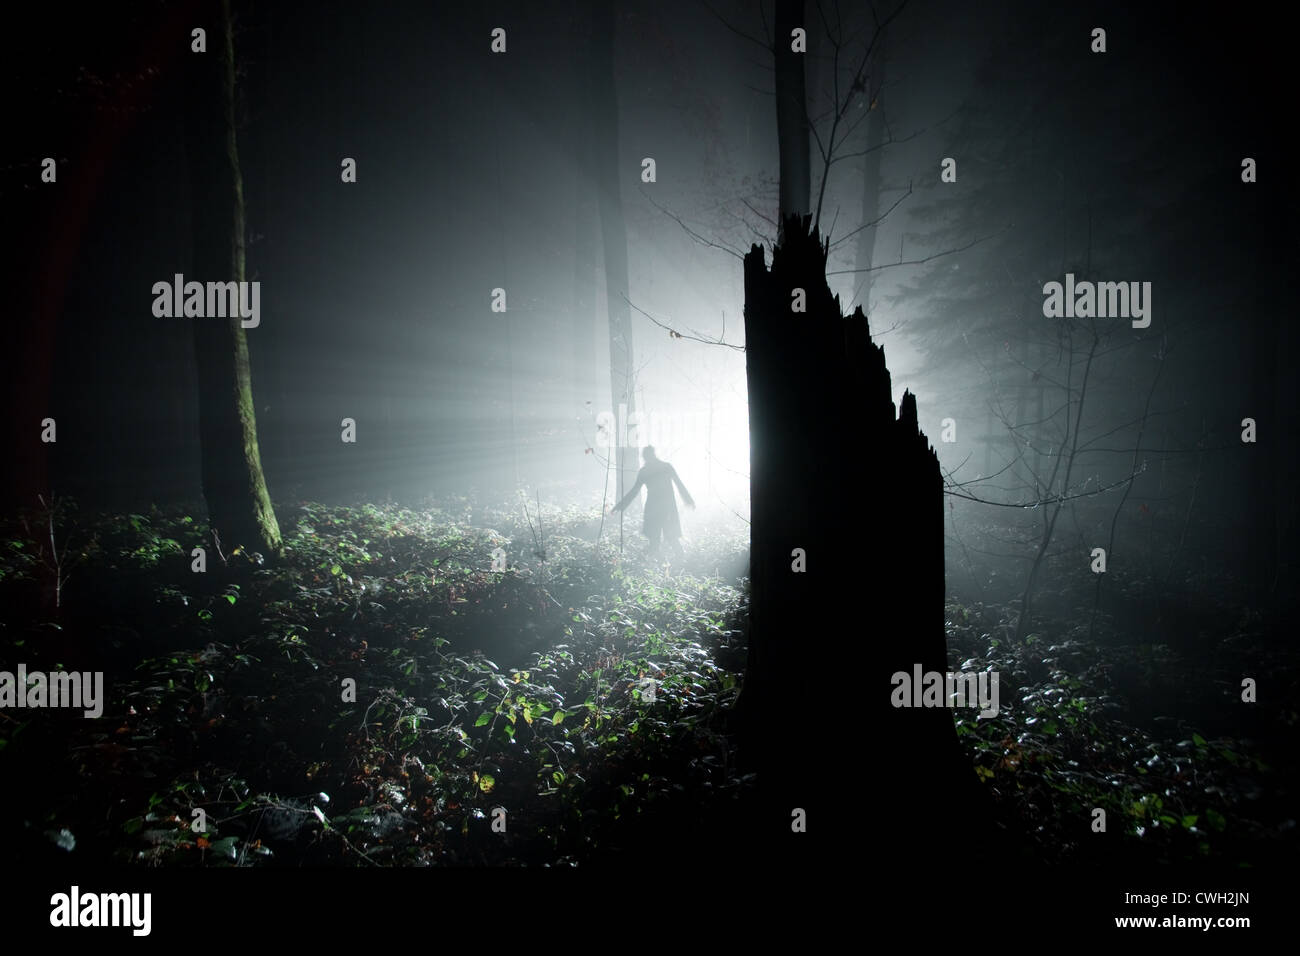 Wald, Nachtleben, Spuk, Spuk Stockbild